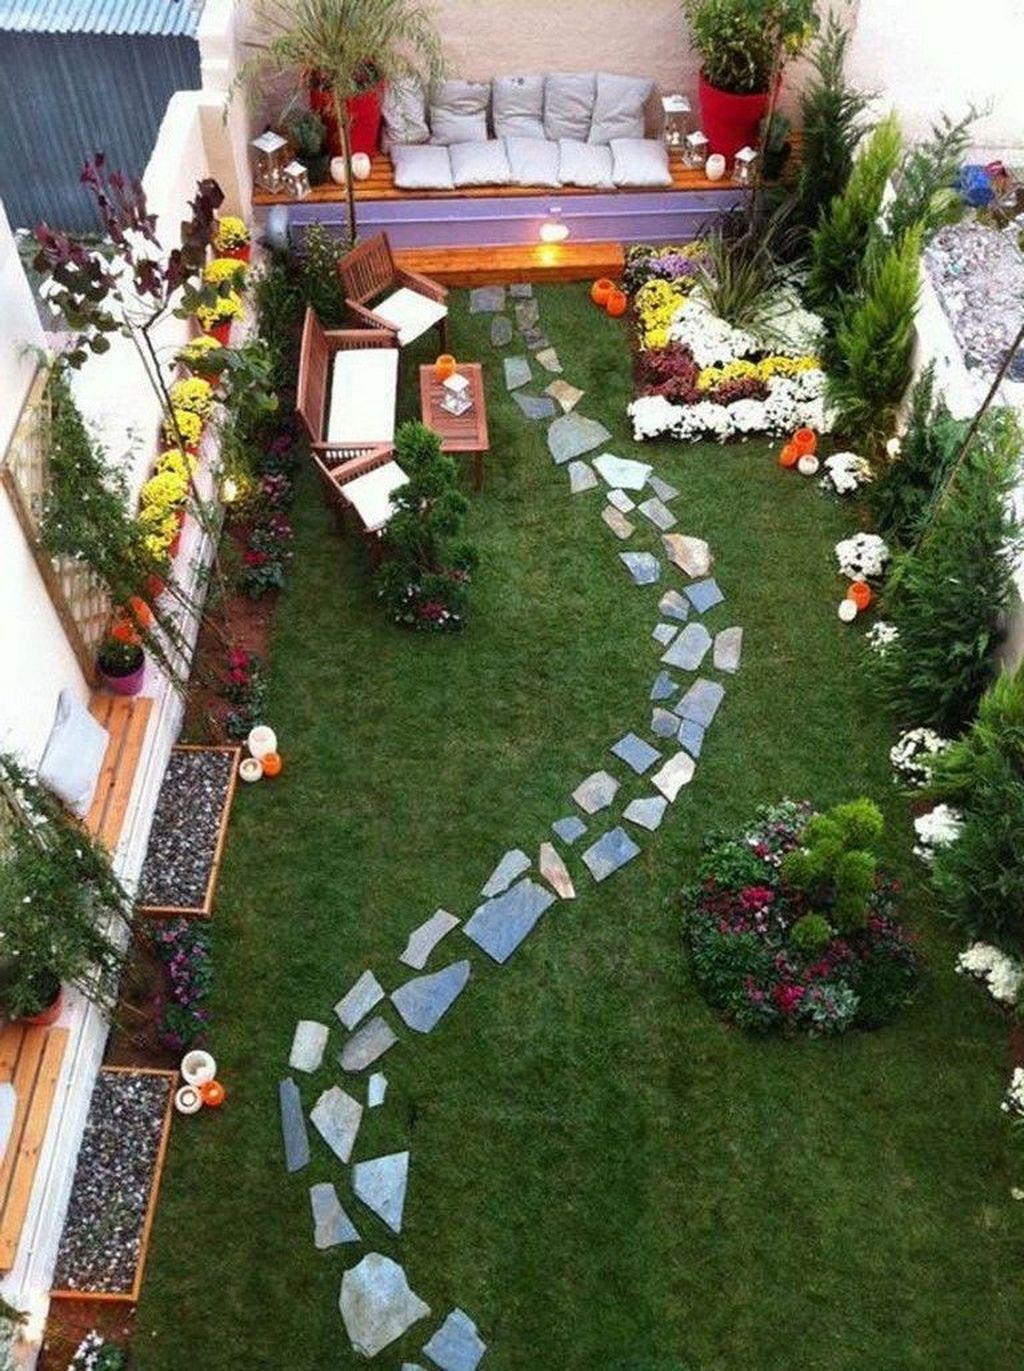 Minimalist Garden Design Ideas For Small Garden 29 Minimalist Garden Large Backyard Landscaping Small Backyard